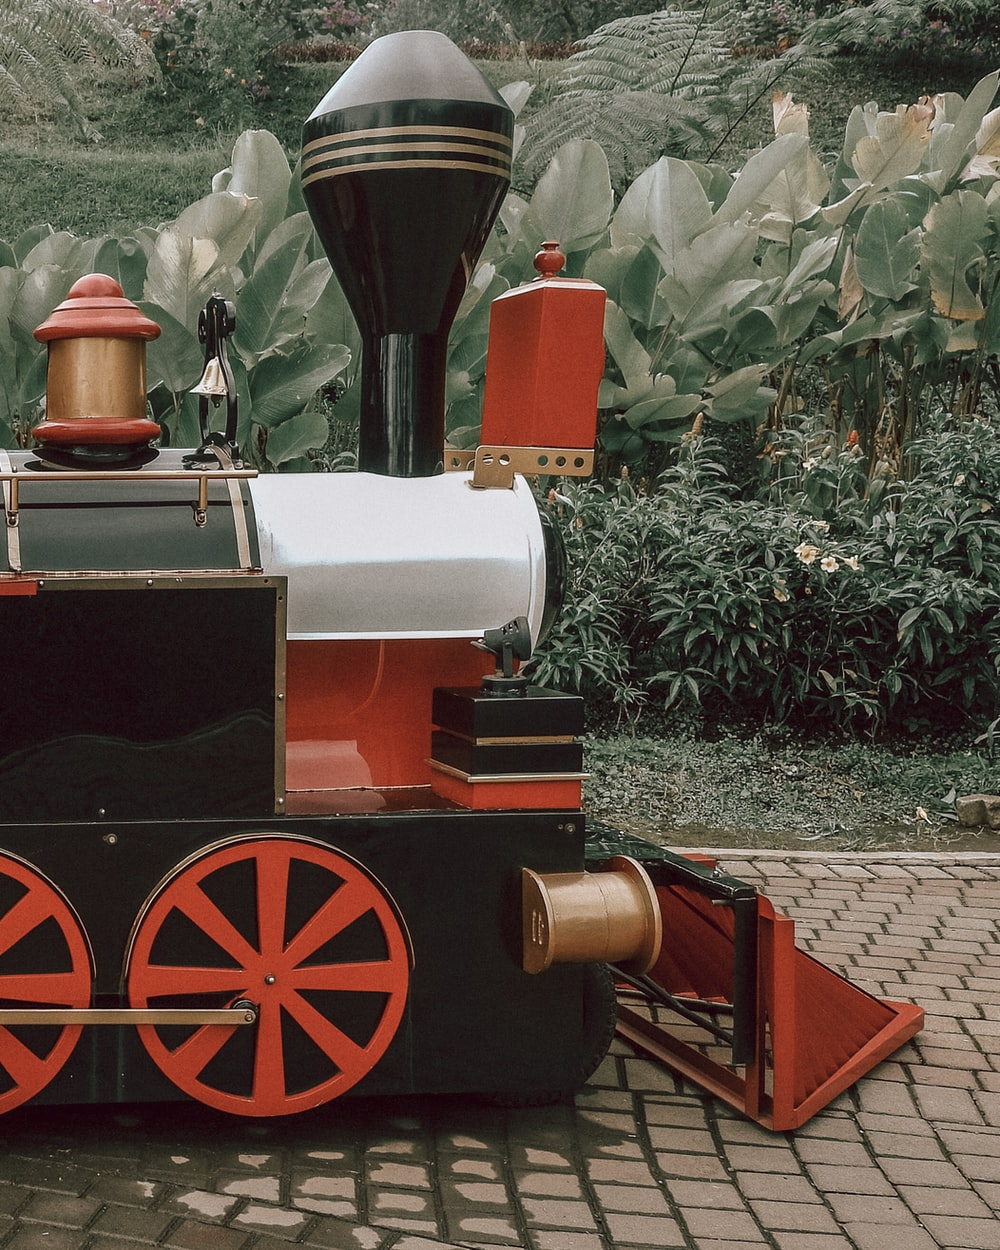 red and black train on rail tracks